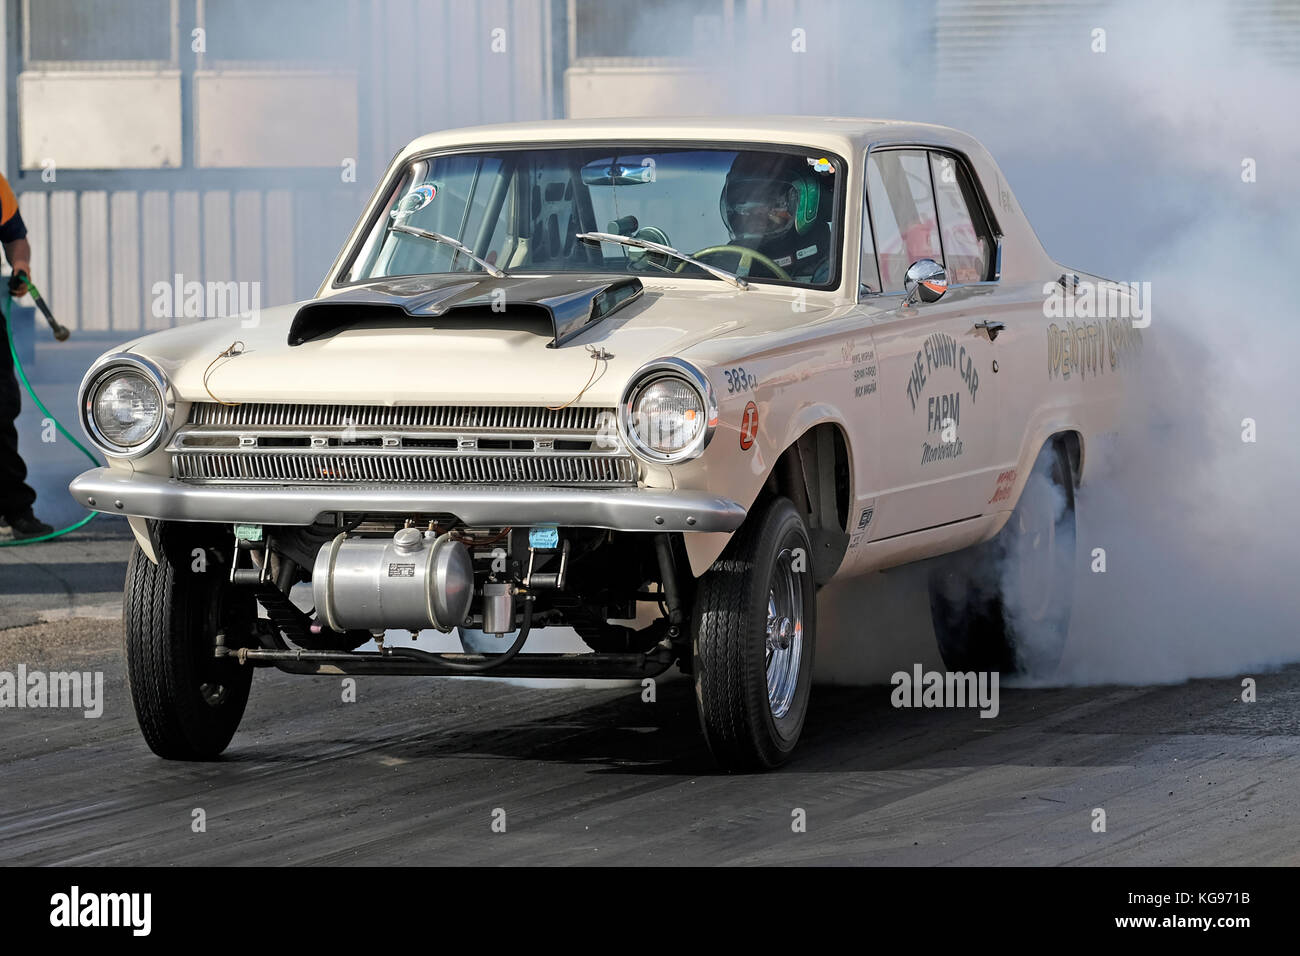 The Funny Car Farm Dodge Dart Gasser Dragster Burns Out At Santa Pod